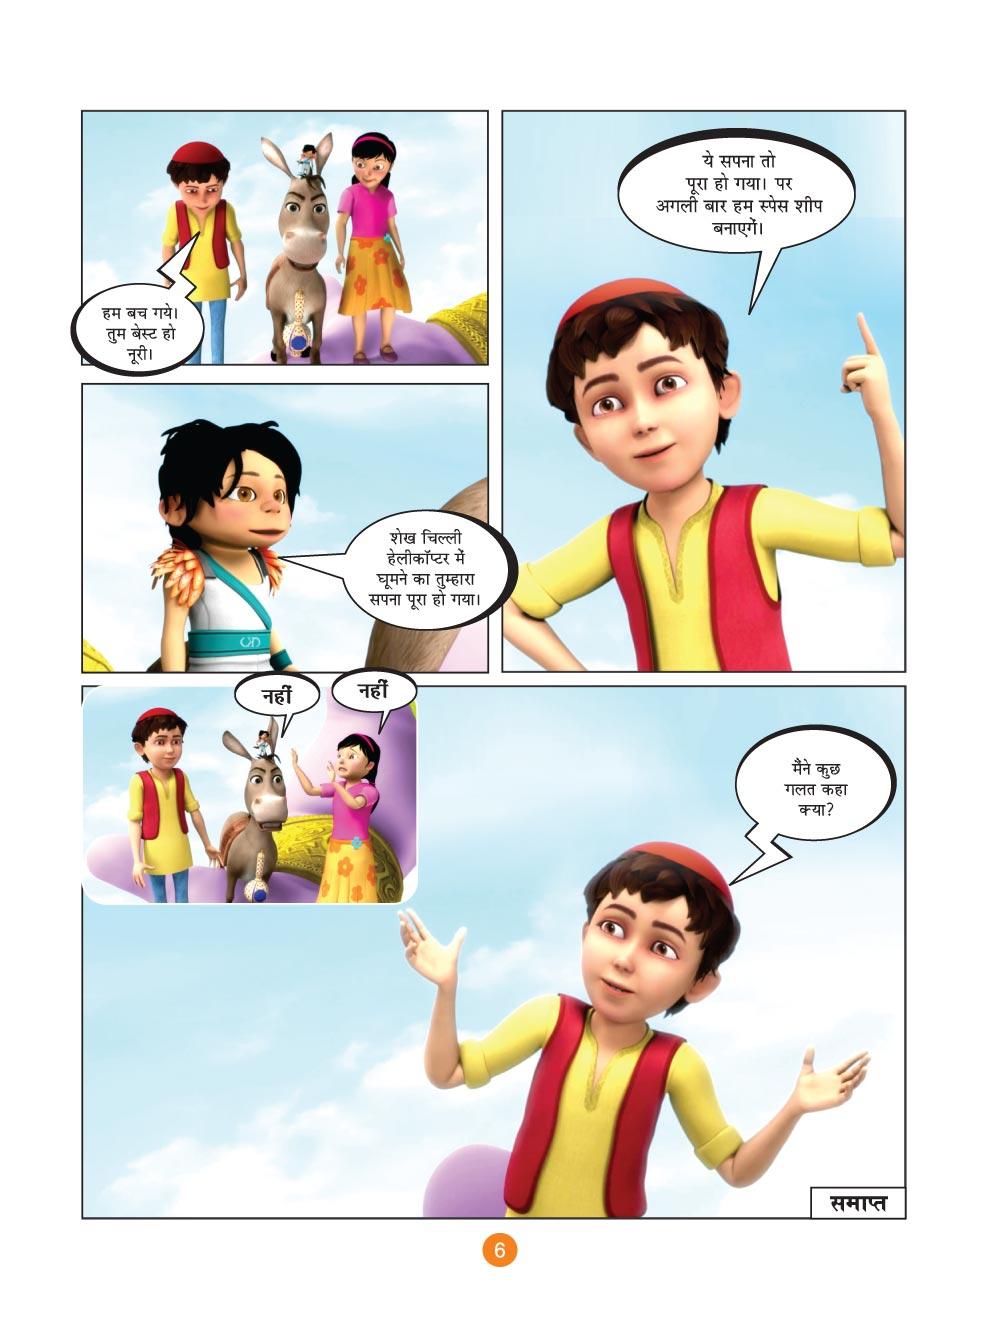 शेख चिल्ली की कॉमिक्स- शेख चिल्ली और हेलीकॉप्टर | Sheikh Chilli Comic Hindi